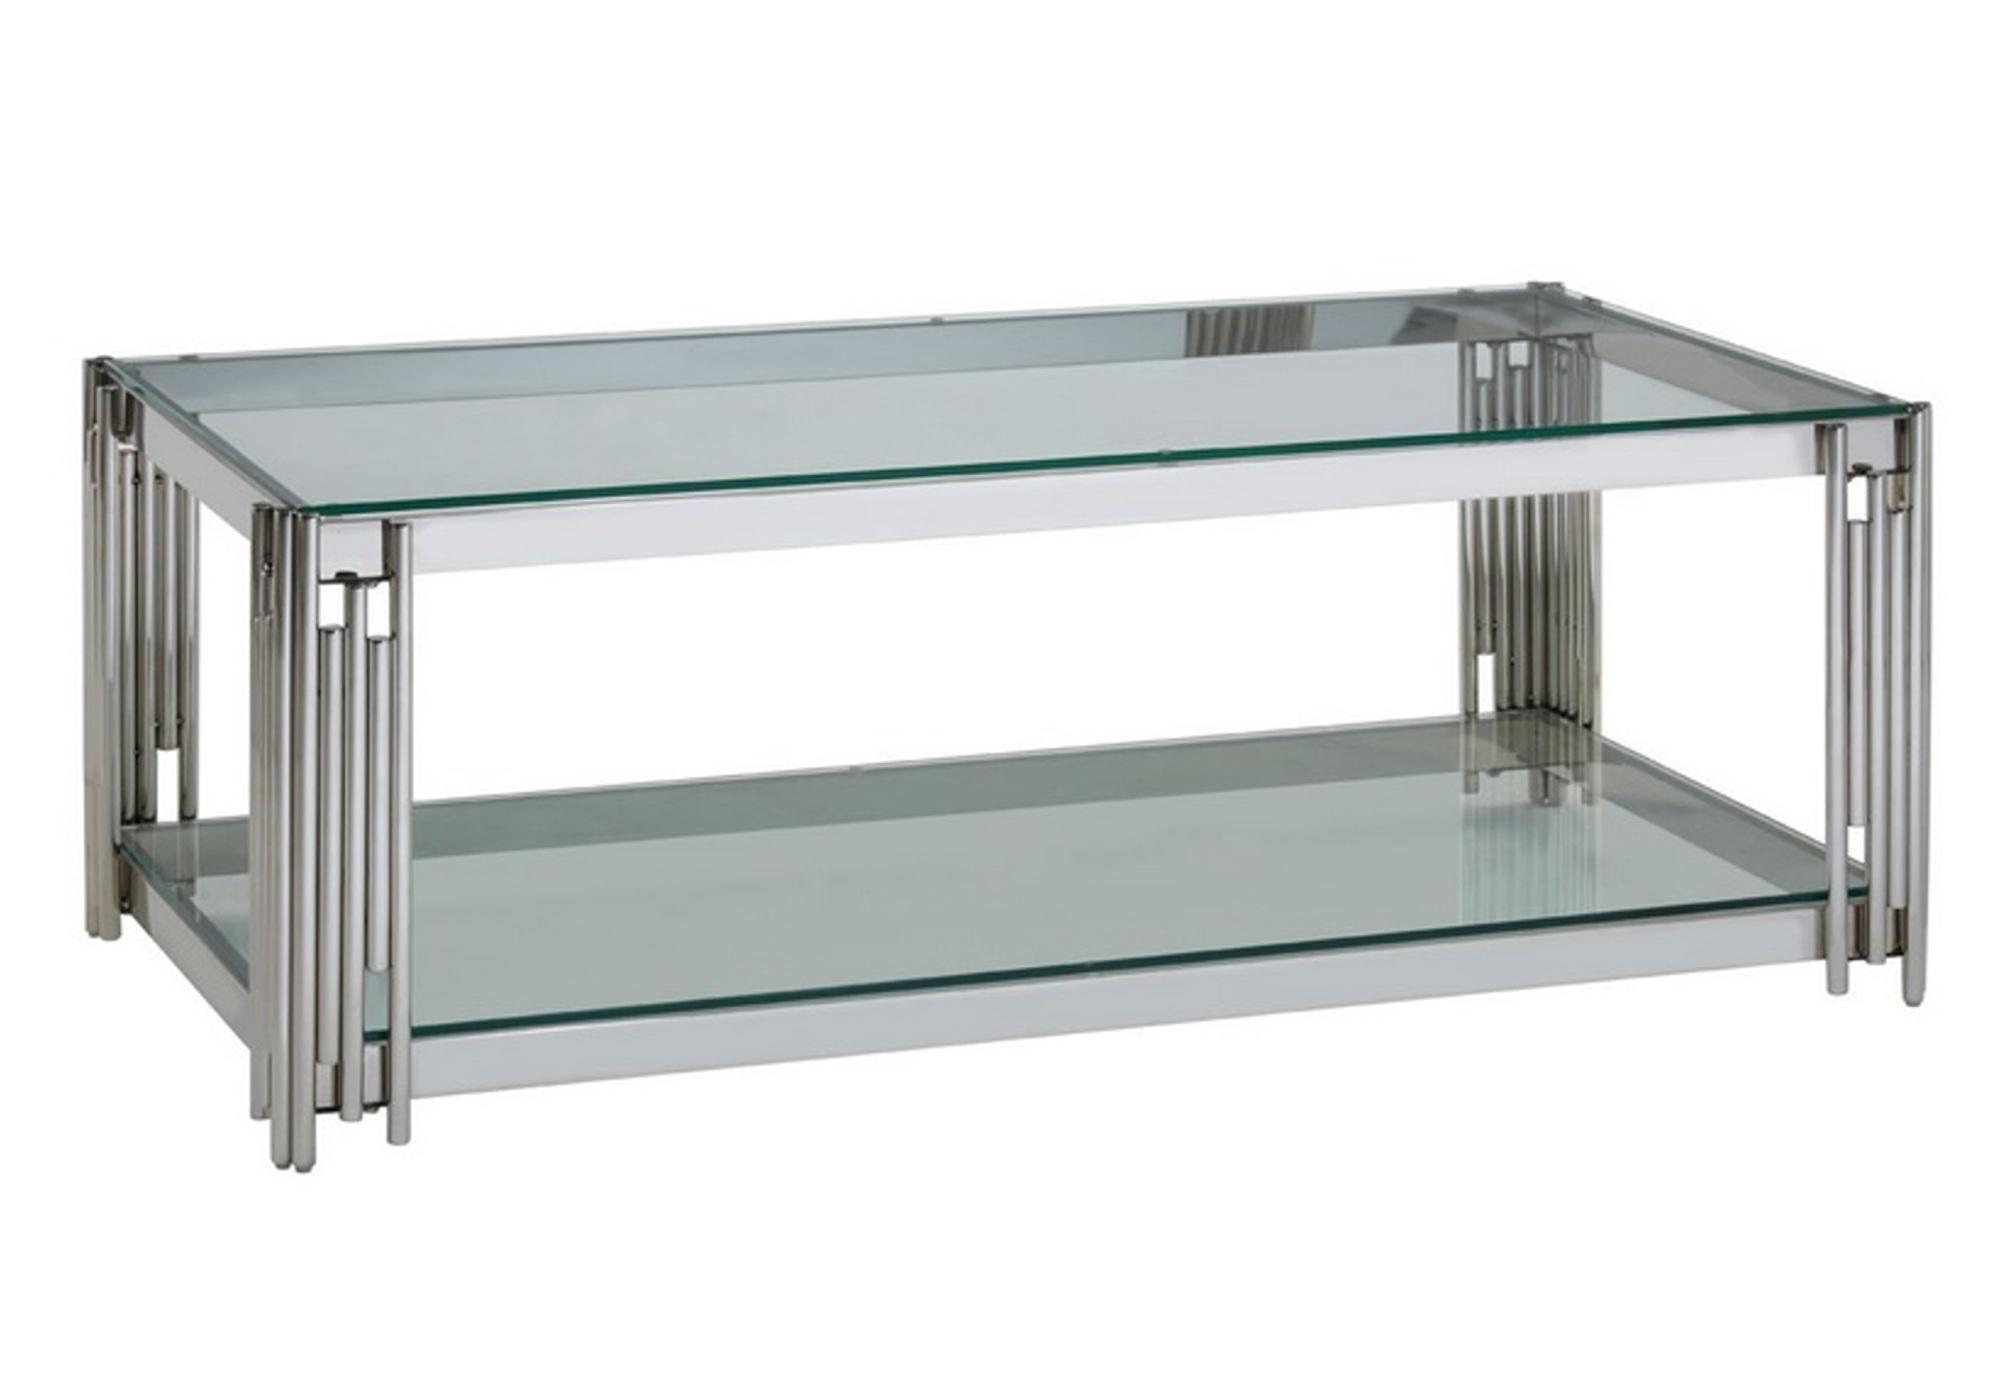 Table basse design chromé verre ÈVE